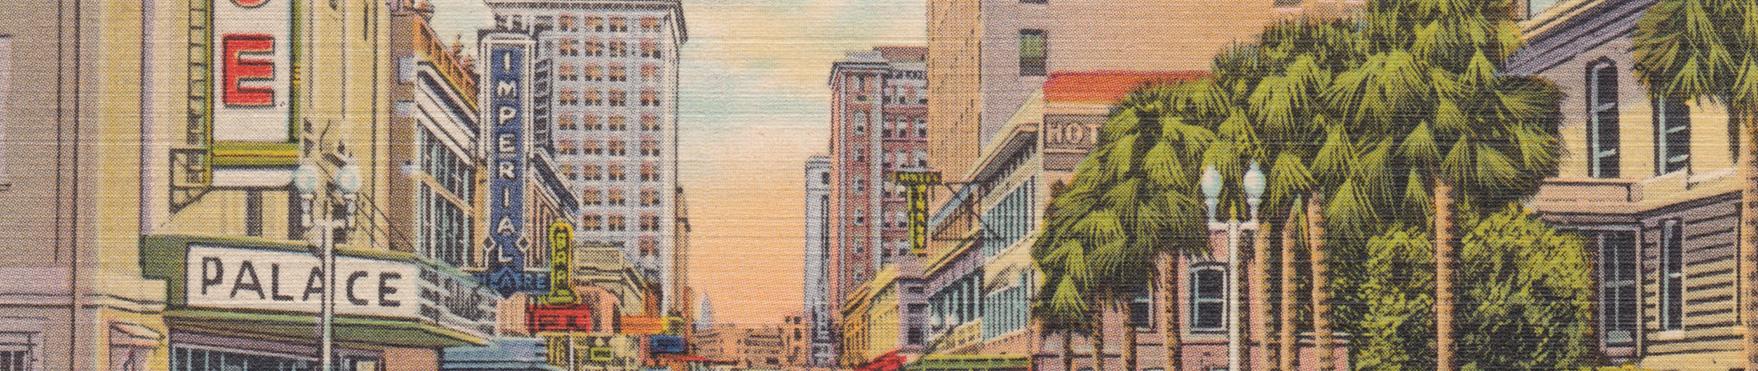 jacksonville-downtown-vintage-banner1.jpg